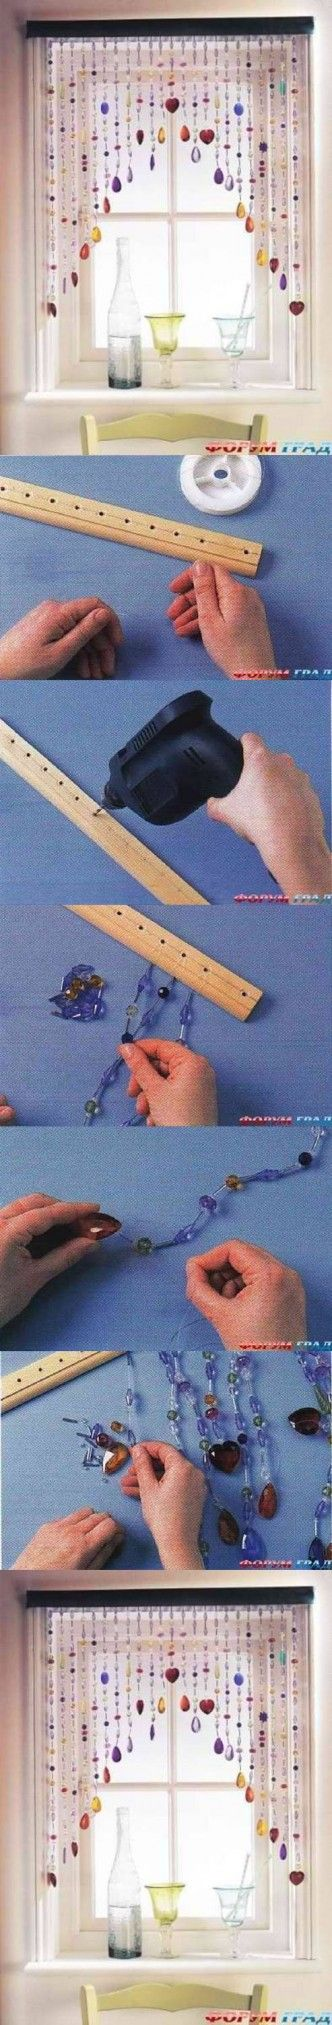 DIY Cute Blinds Curtain DIY Projects